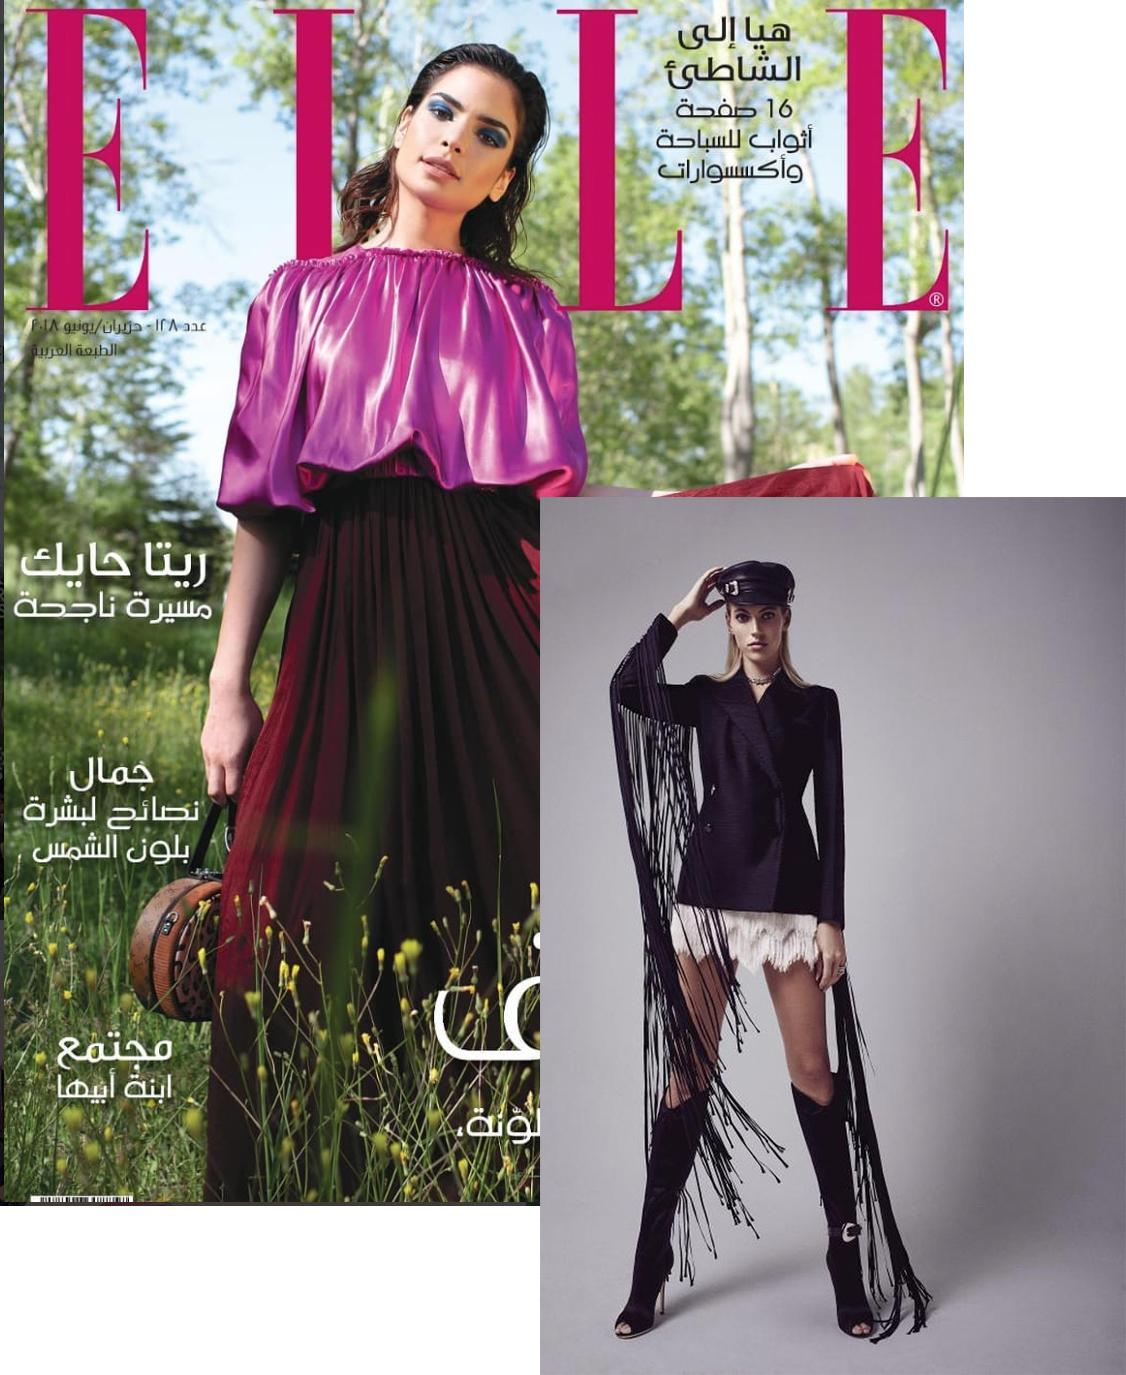 Elle Arabia Editorial